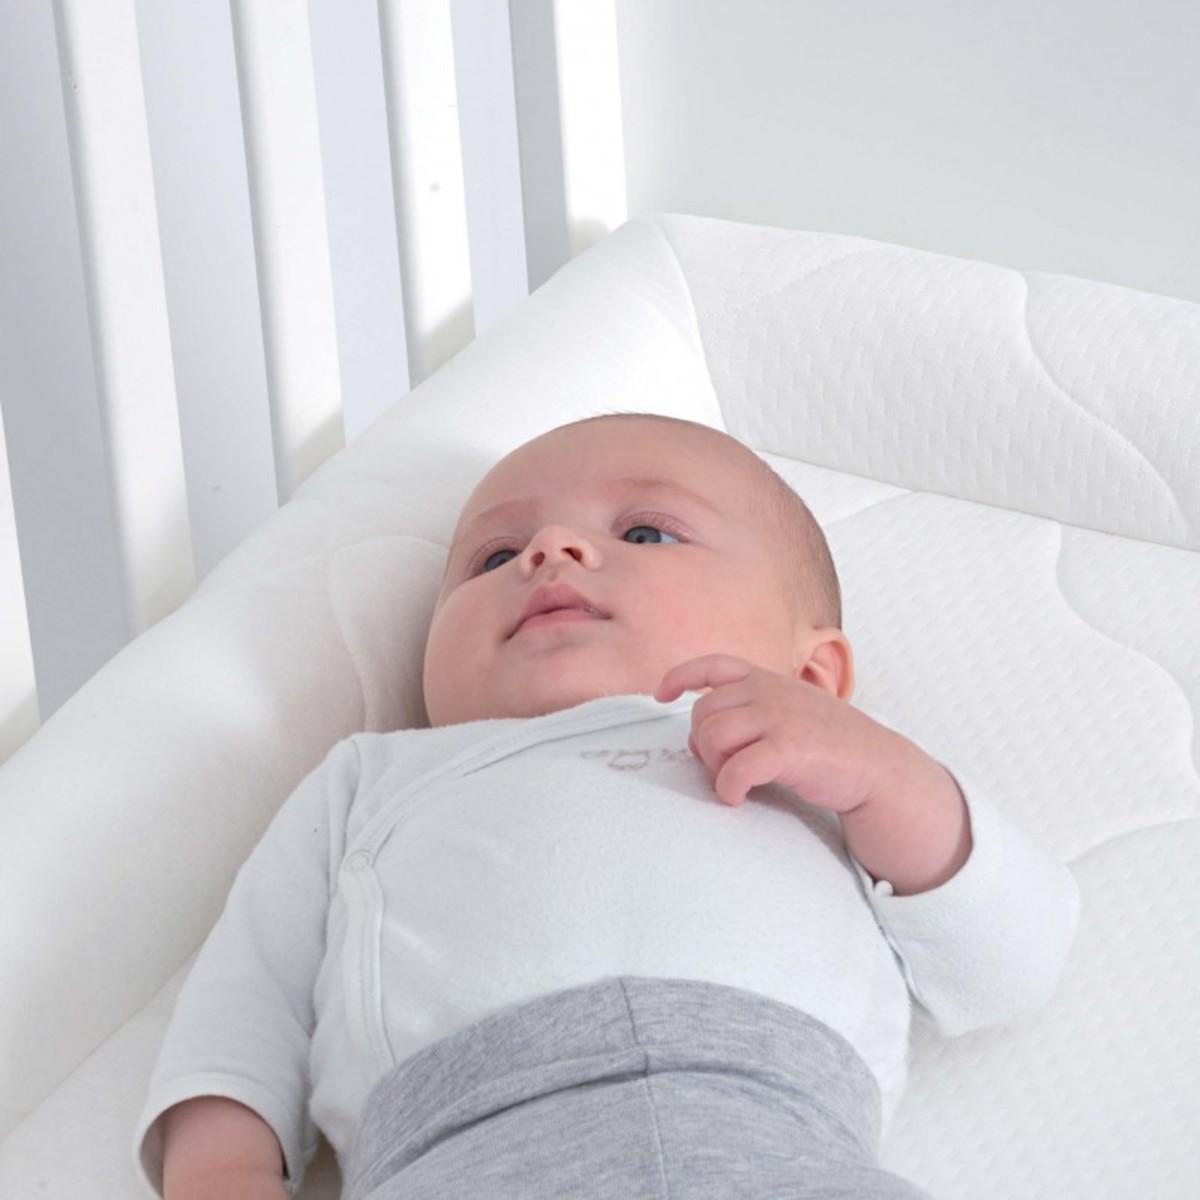 tin o matelas baby protect 60 x 120 cm matelas b b tin o sur l 39 armoire de b b. Black Bedroom Furniture Sets. Home Design Ideas